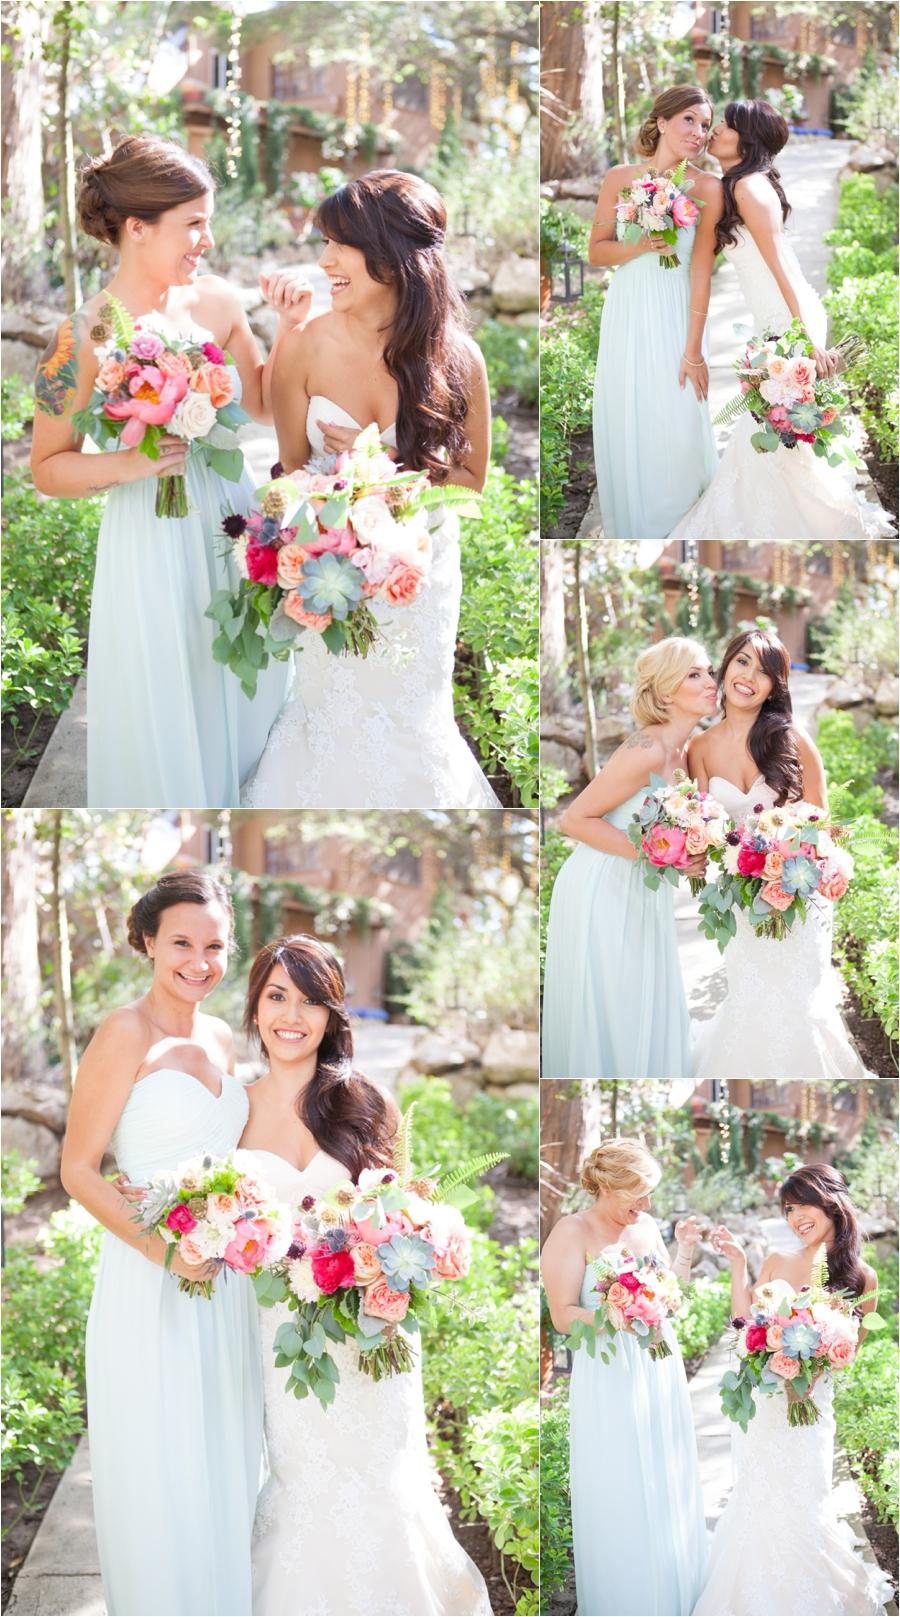 Jasmine and Donny- Calamigos Ranch Wedding ©Shaun and Skyla Walton-61.jpg